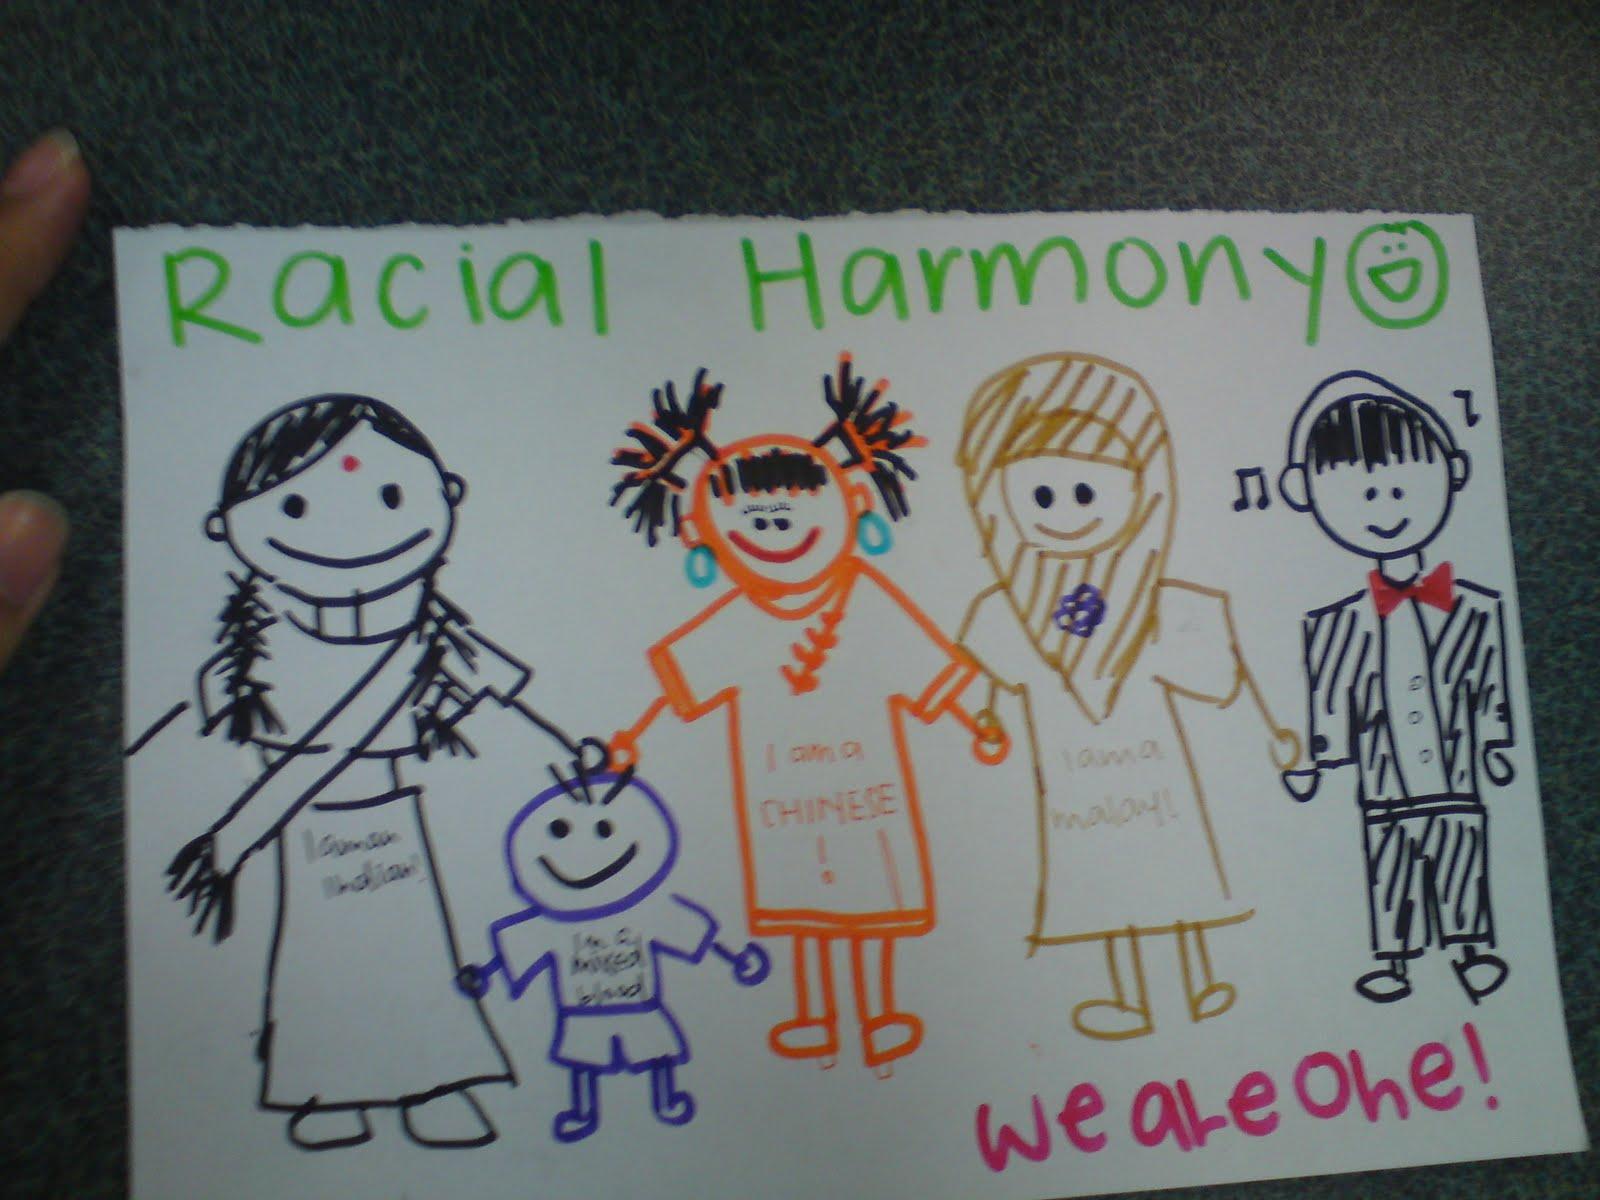 my racial harmony poster